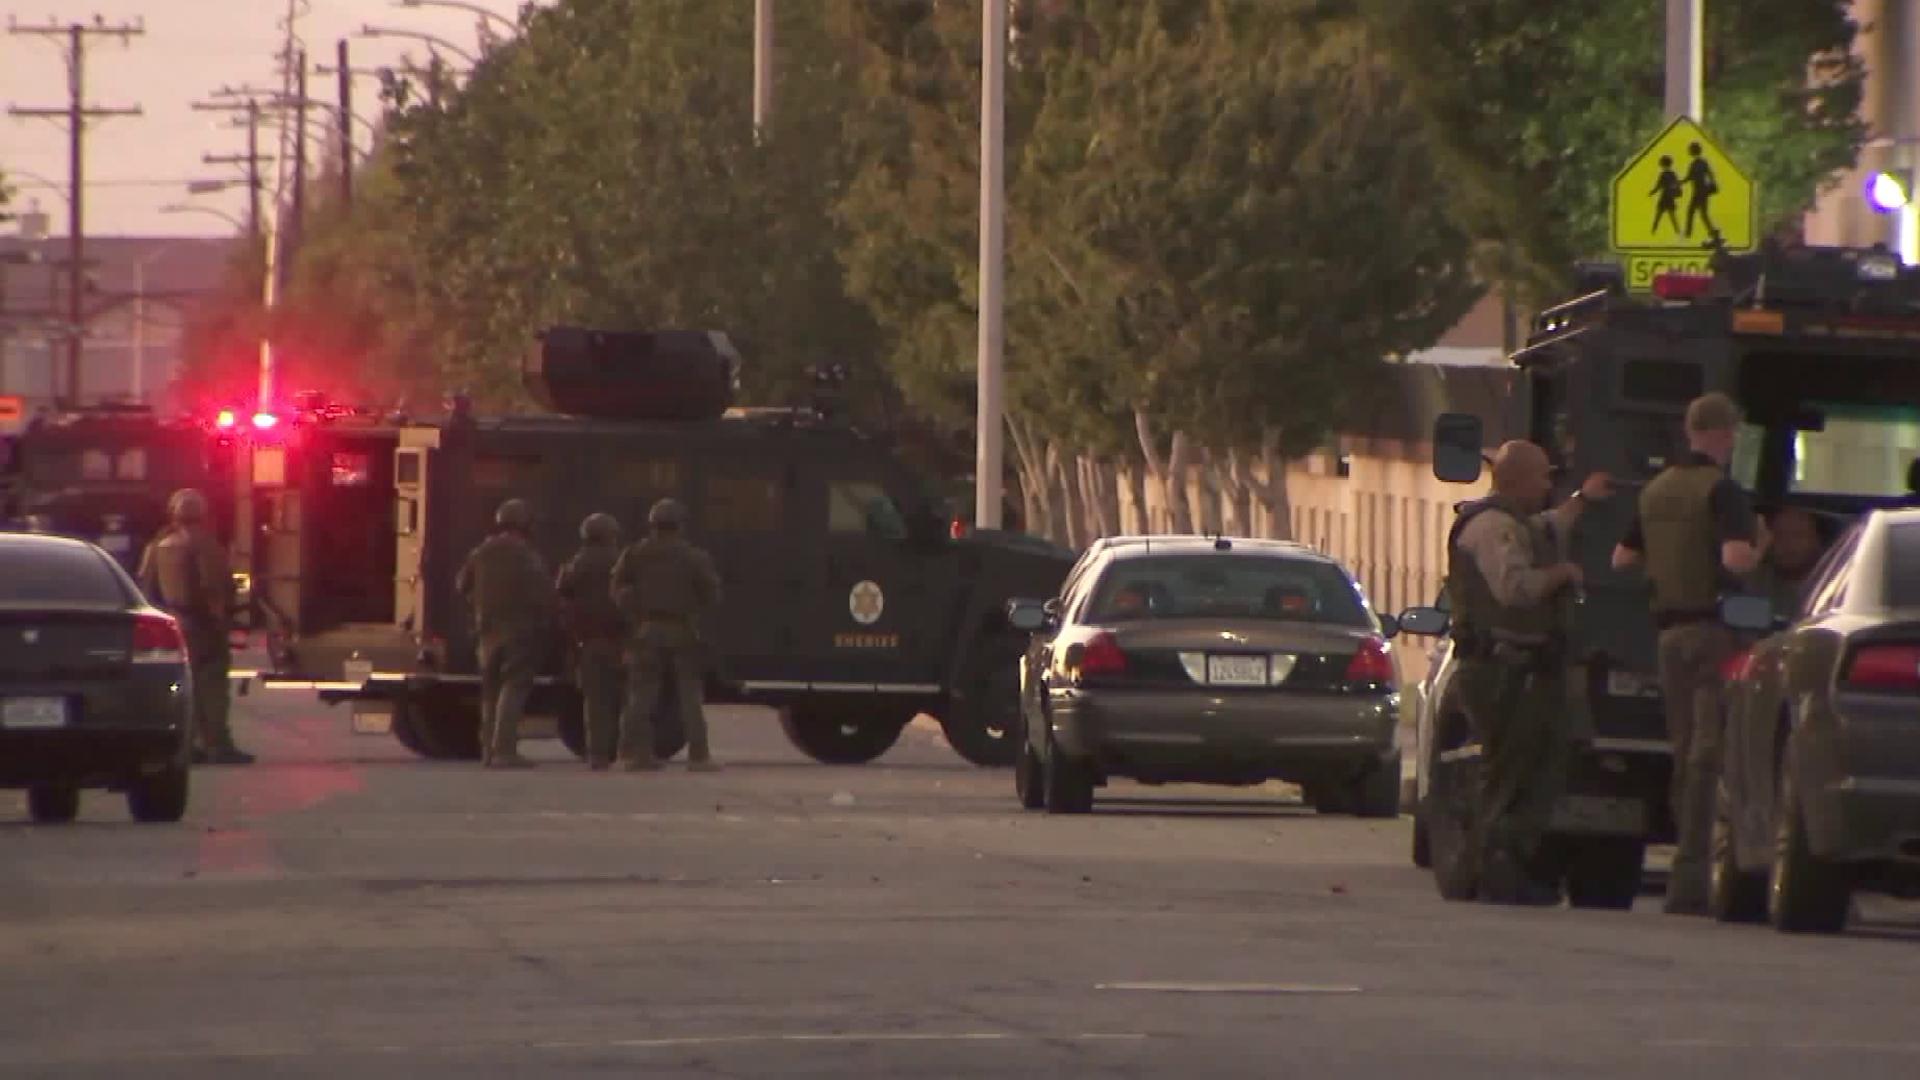 SWAT teams responded to Lancaster after a shooting left a deputy injured in Lancaster on Aug. 21, 2019. (Credit: KTLA)